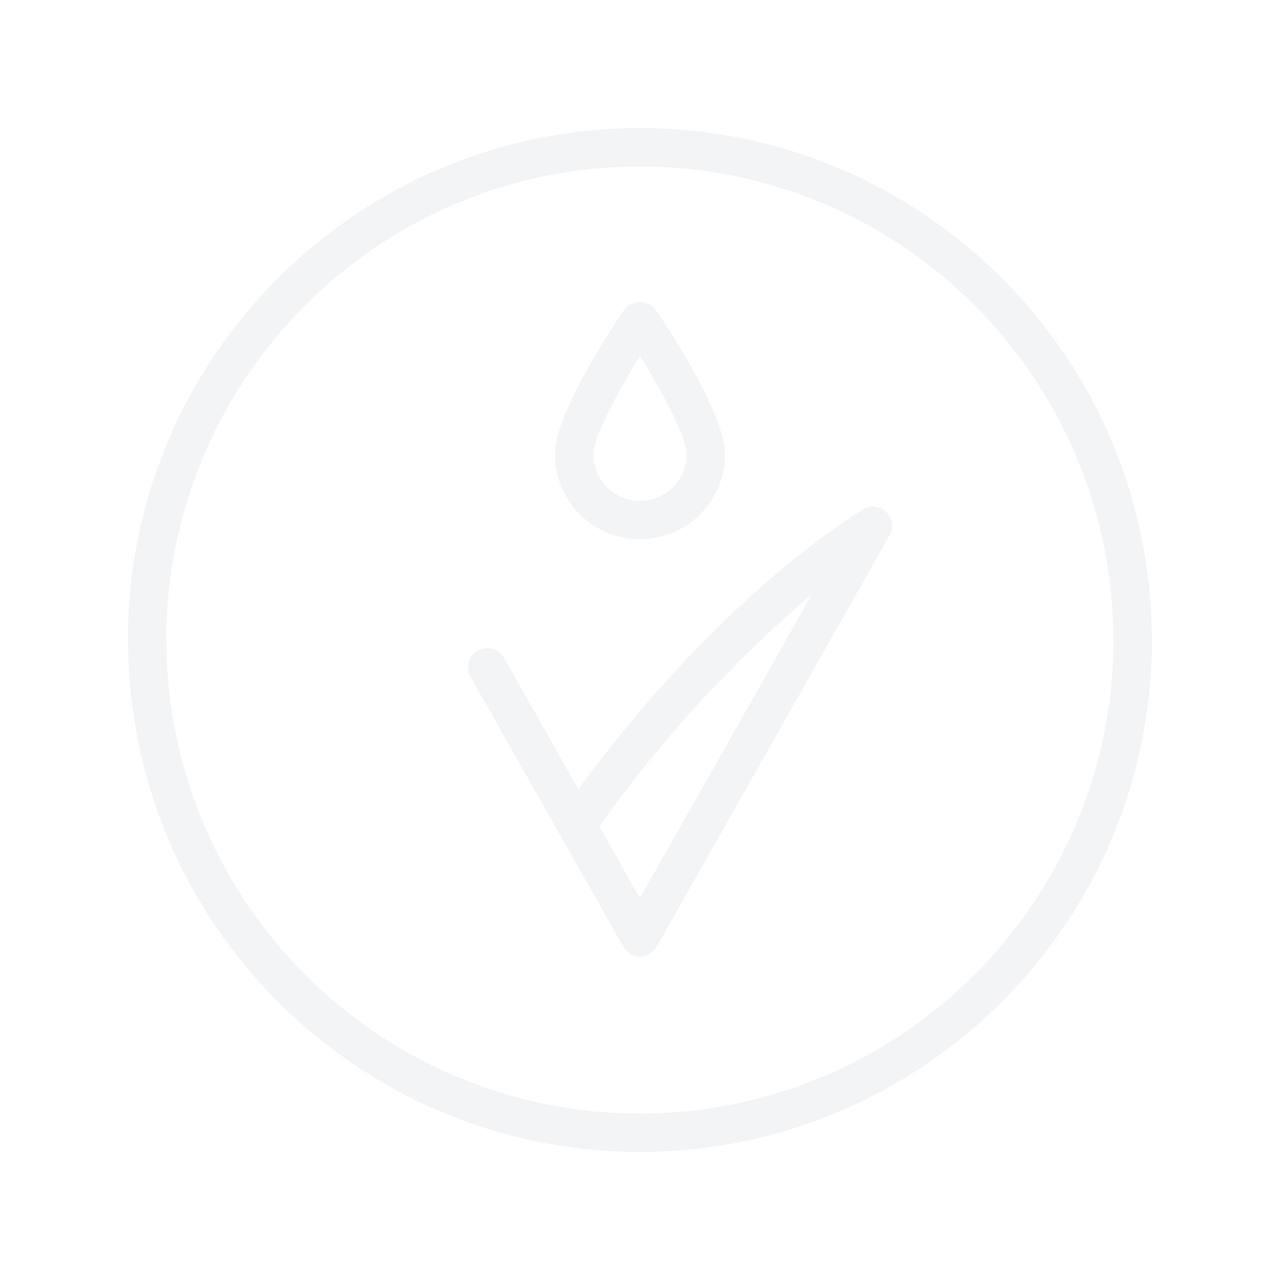 L'OREAL PROFESSIONNEL Powermix Sun-Kissed Blonde Perfector 15ml